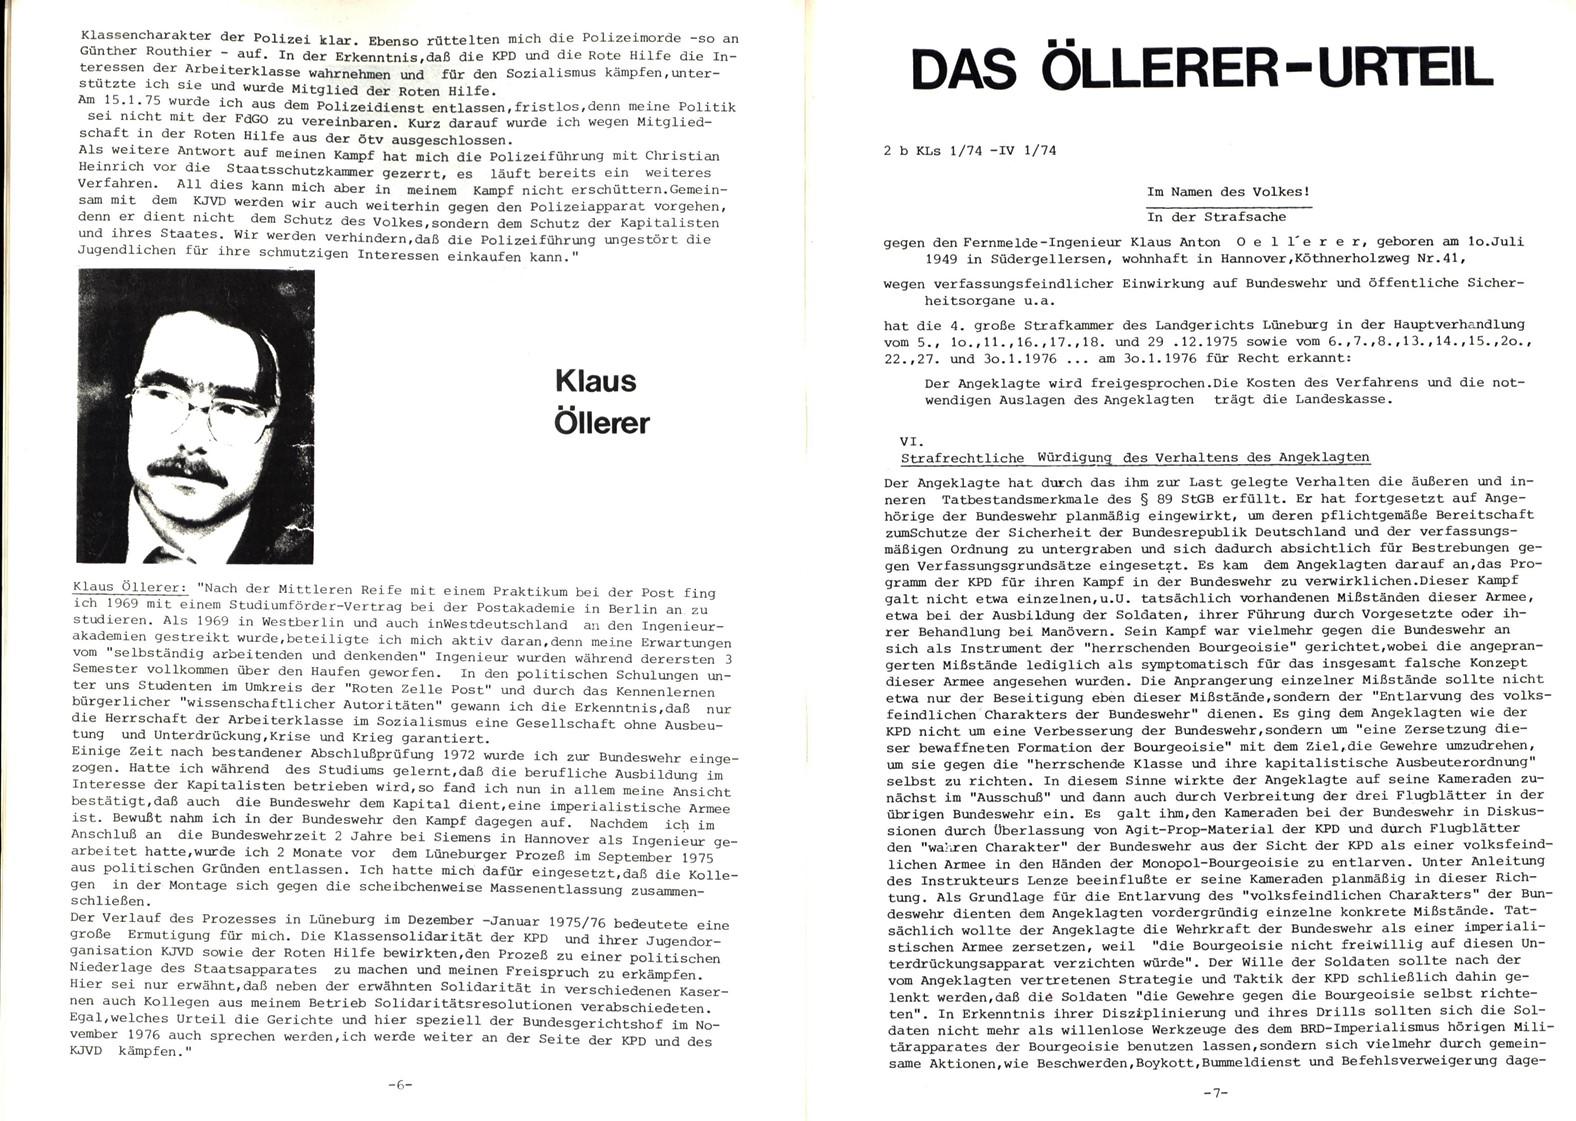 KPDAO_1976_Staatsschutzparagrafen_04